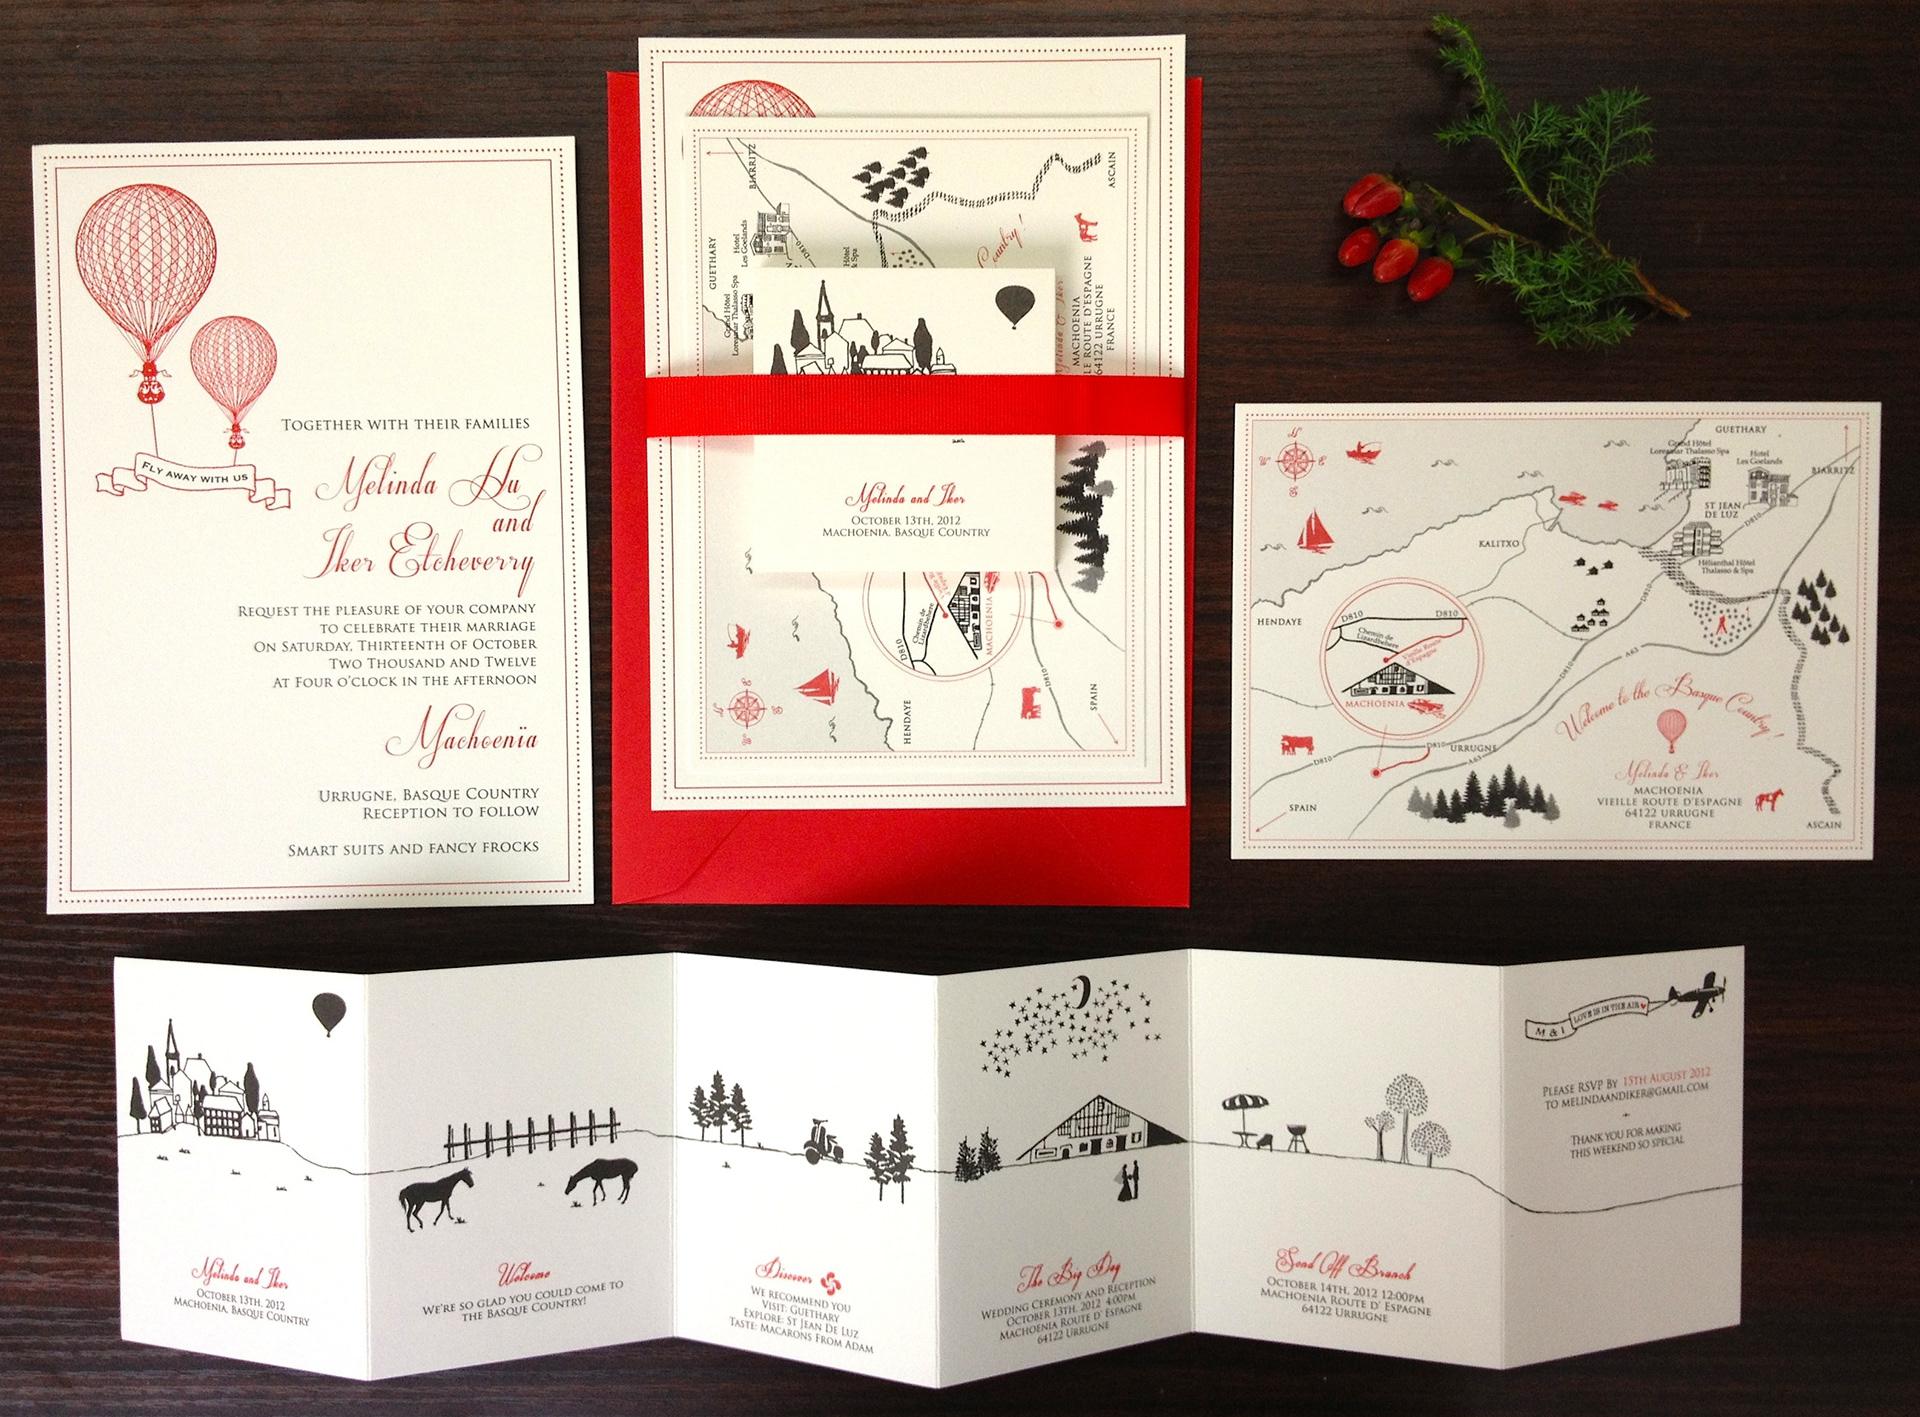 Ka Lo Chu - Rustic Basque Country Wedding Invitation